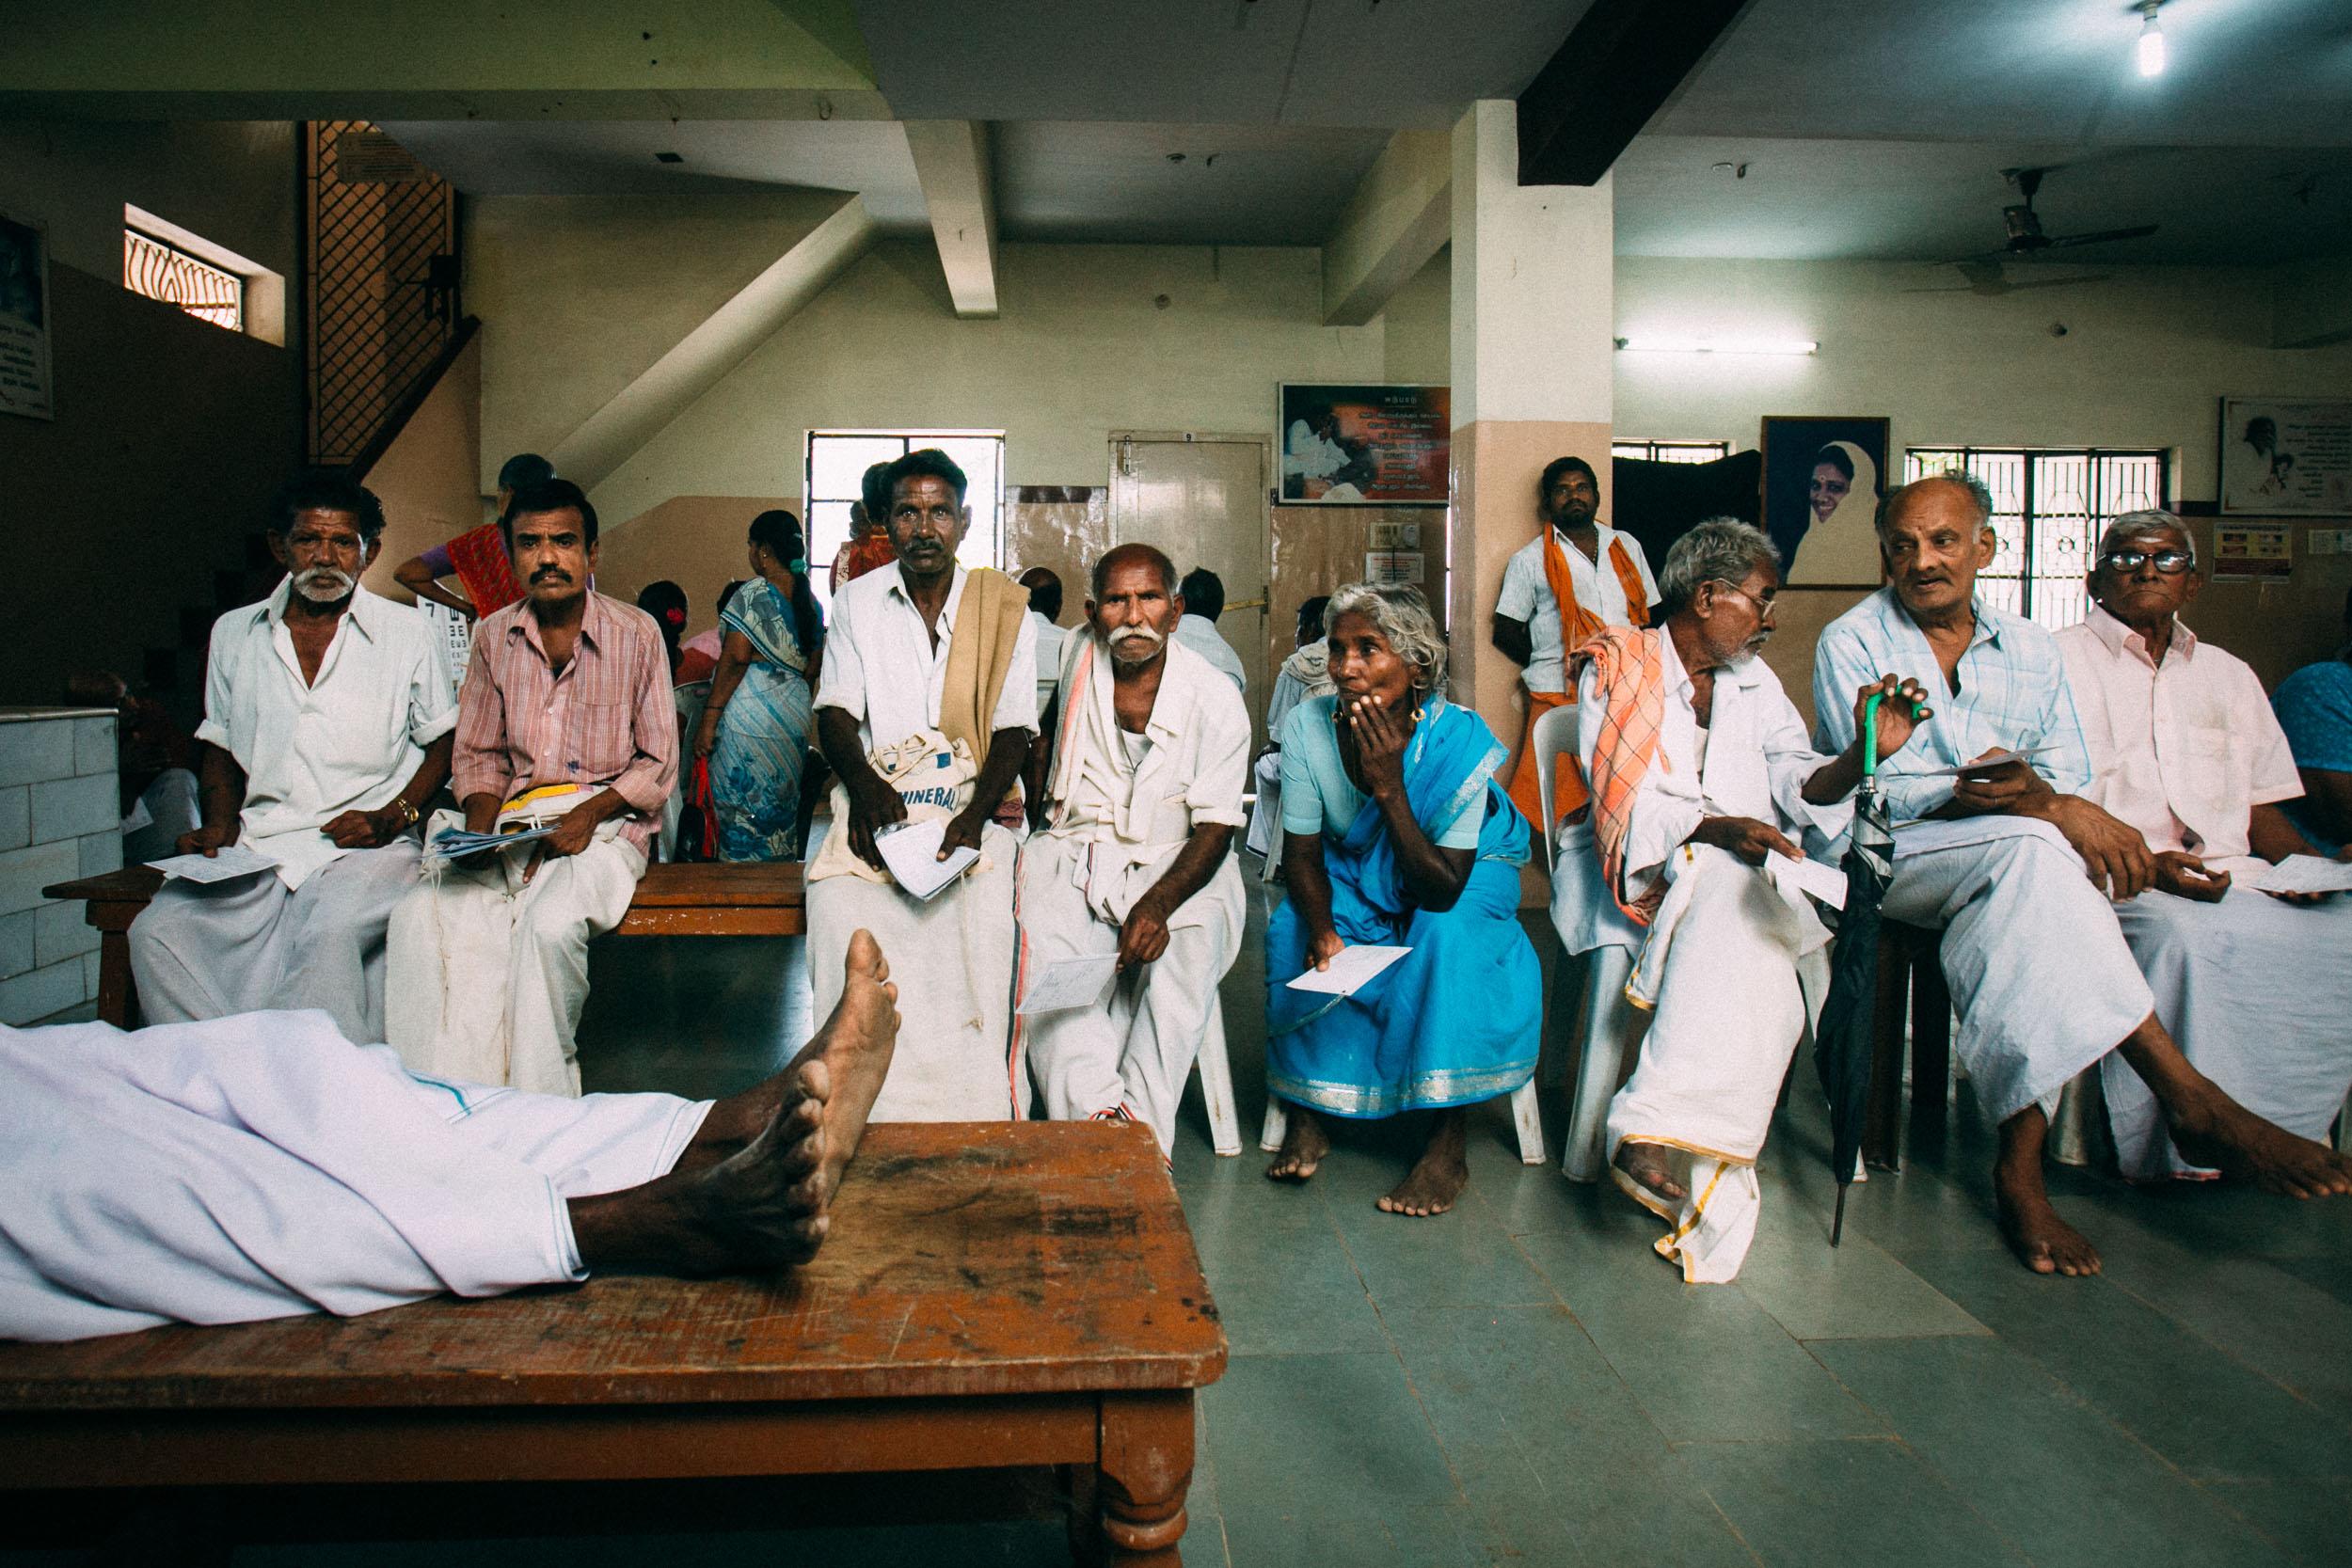 brian-callaway-india-photography-aravind-eye-hospital-20.jpg